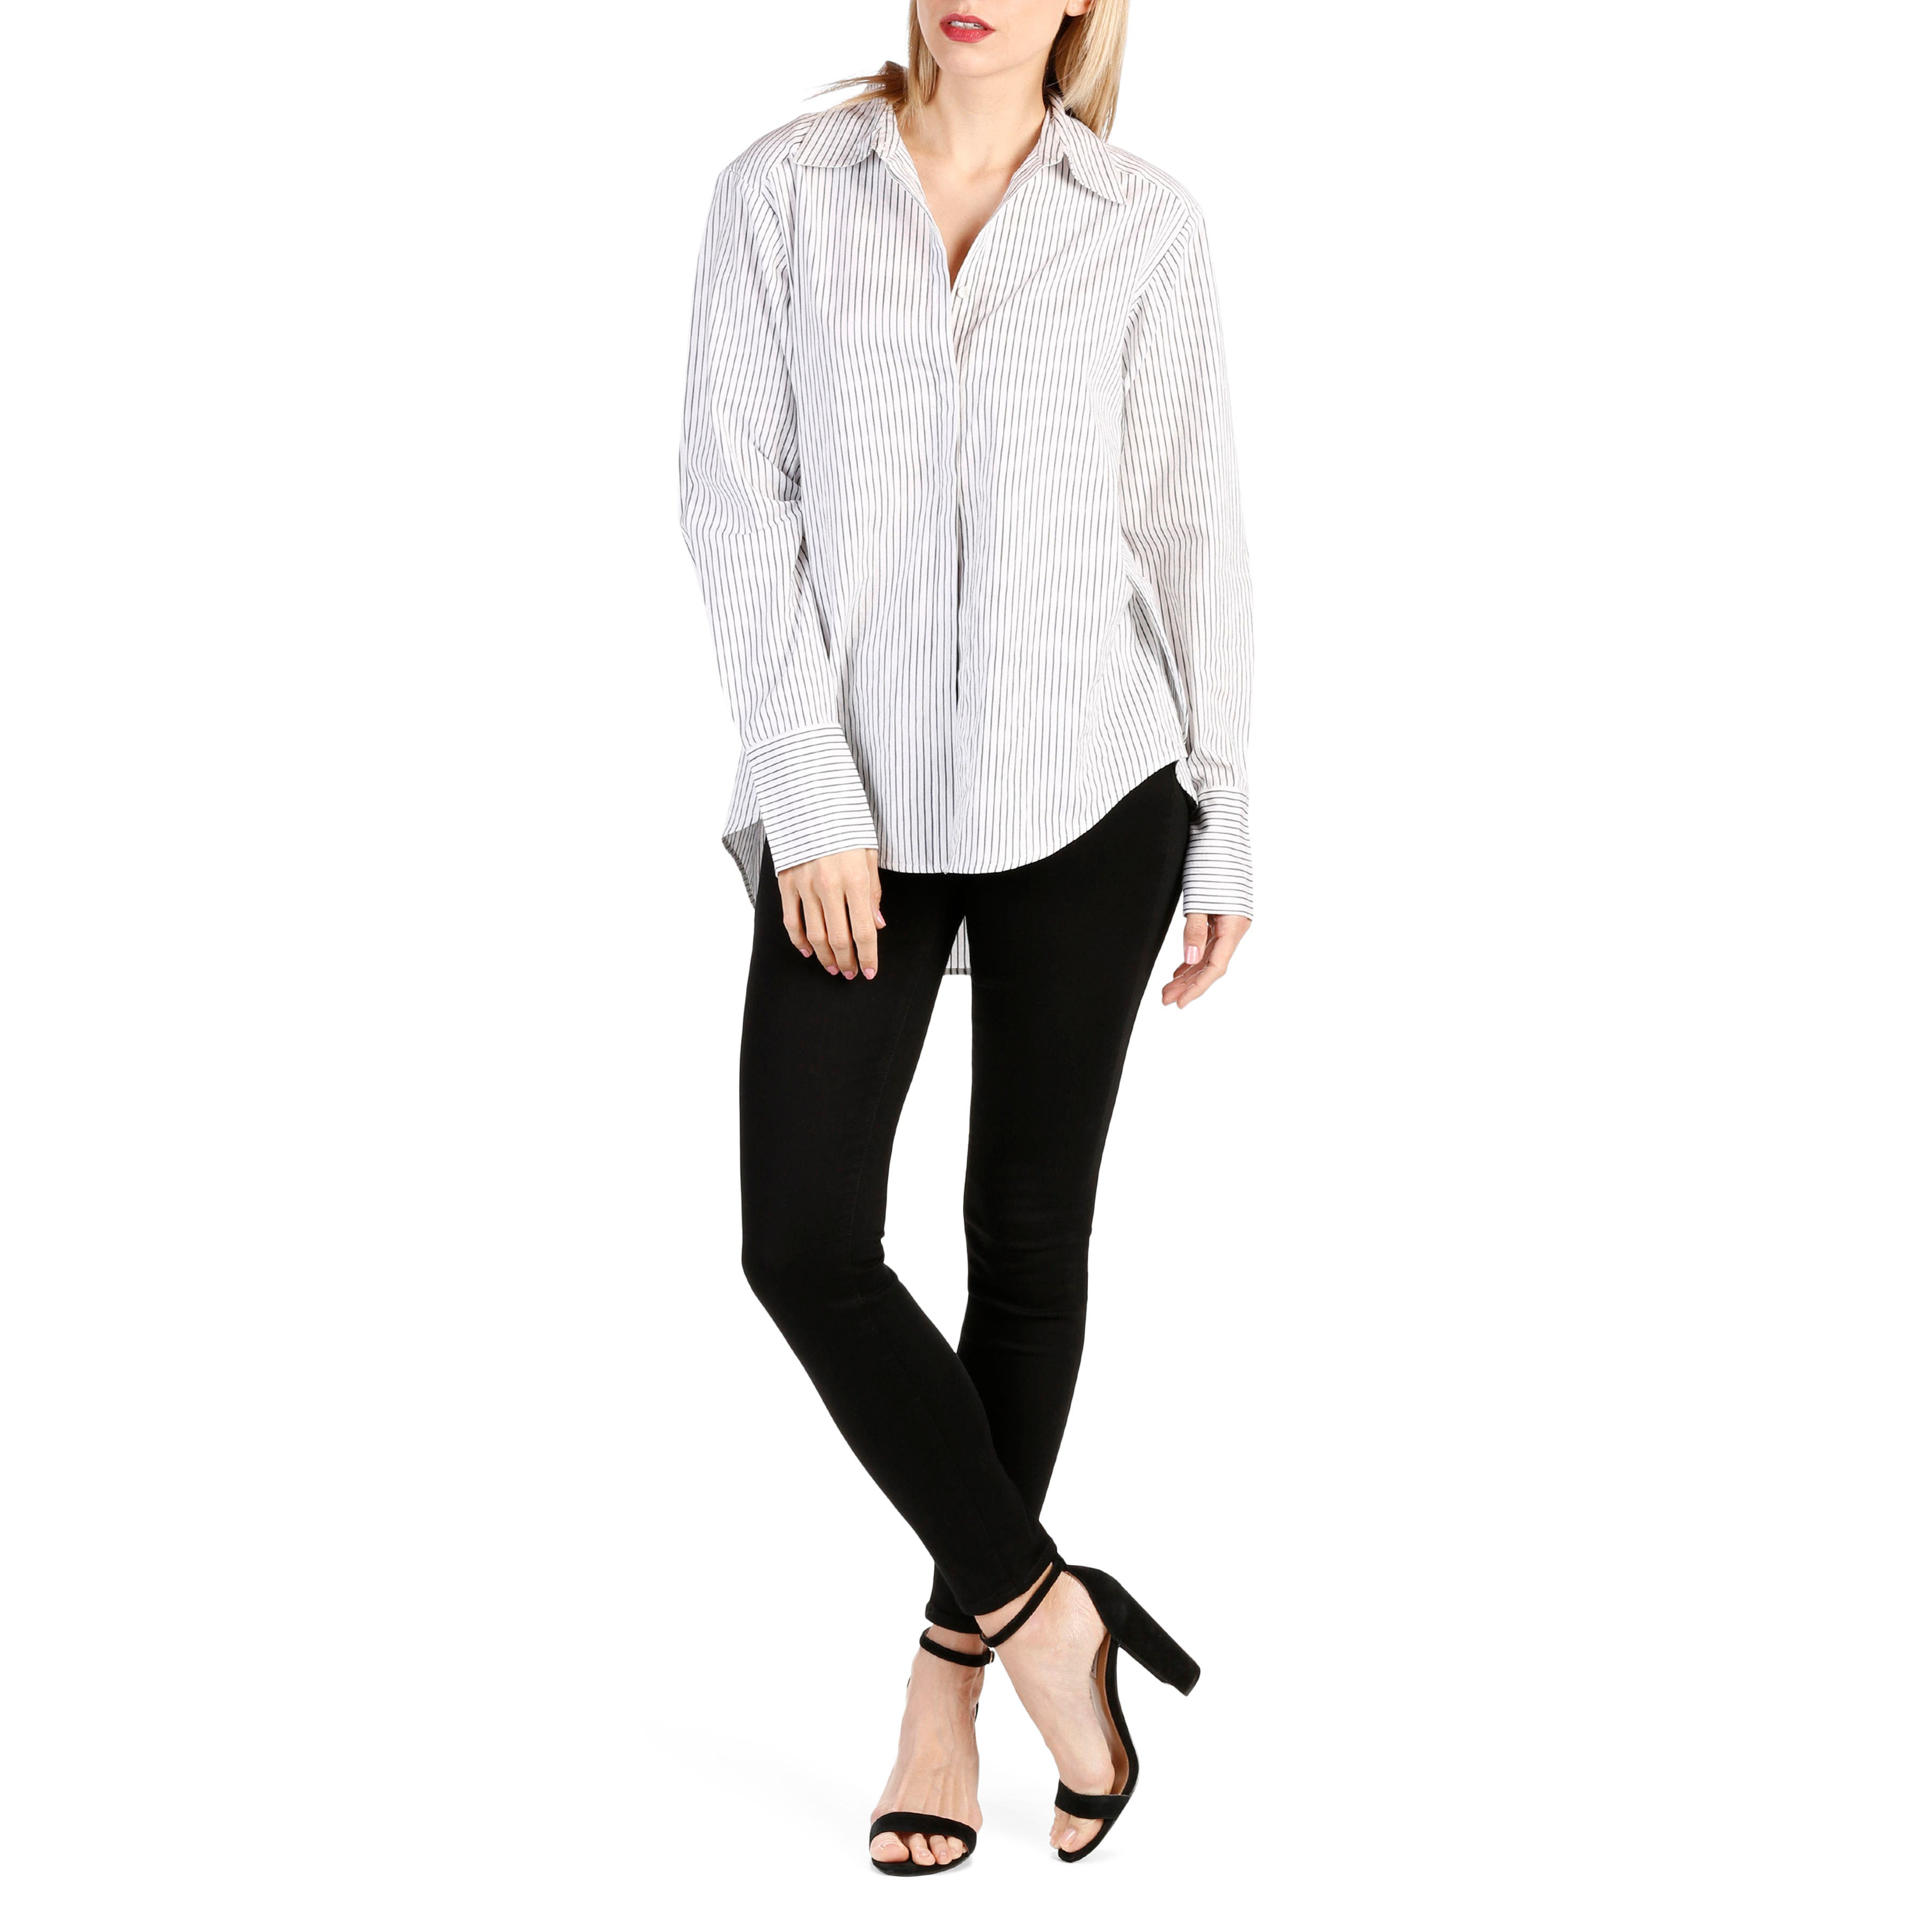 Clemence Stripe Shirt,                             Alternate thumbnail 4, color,                             Black And White Stripe